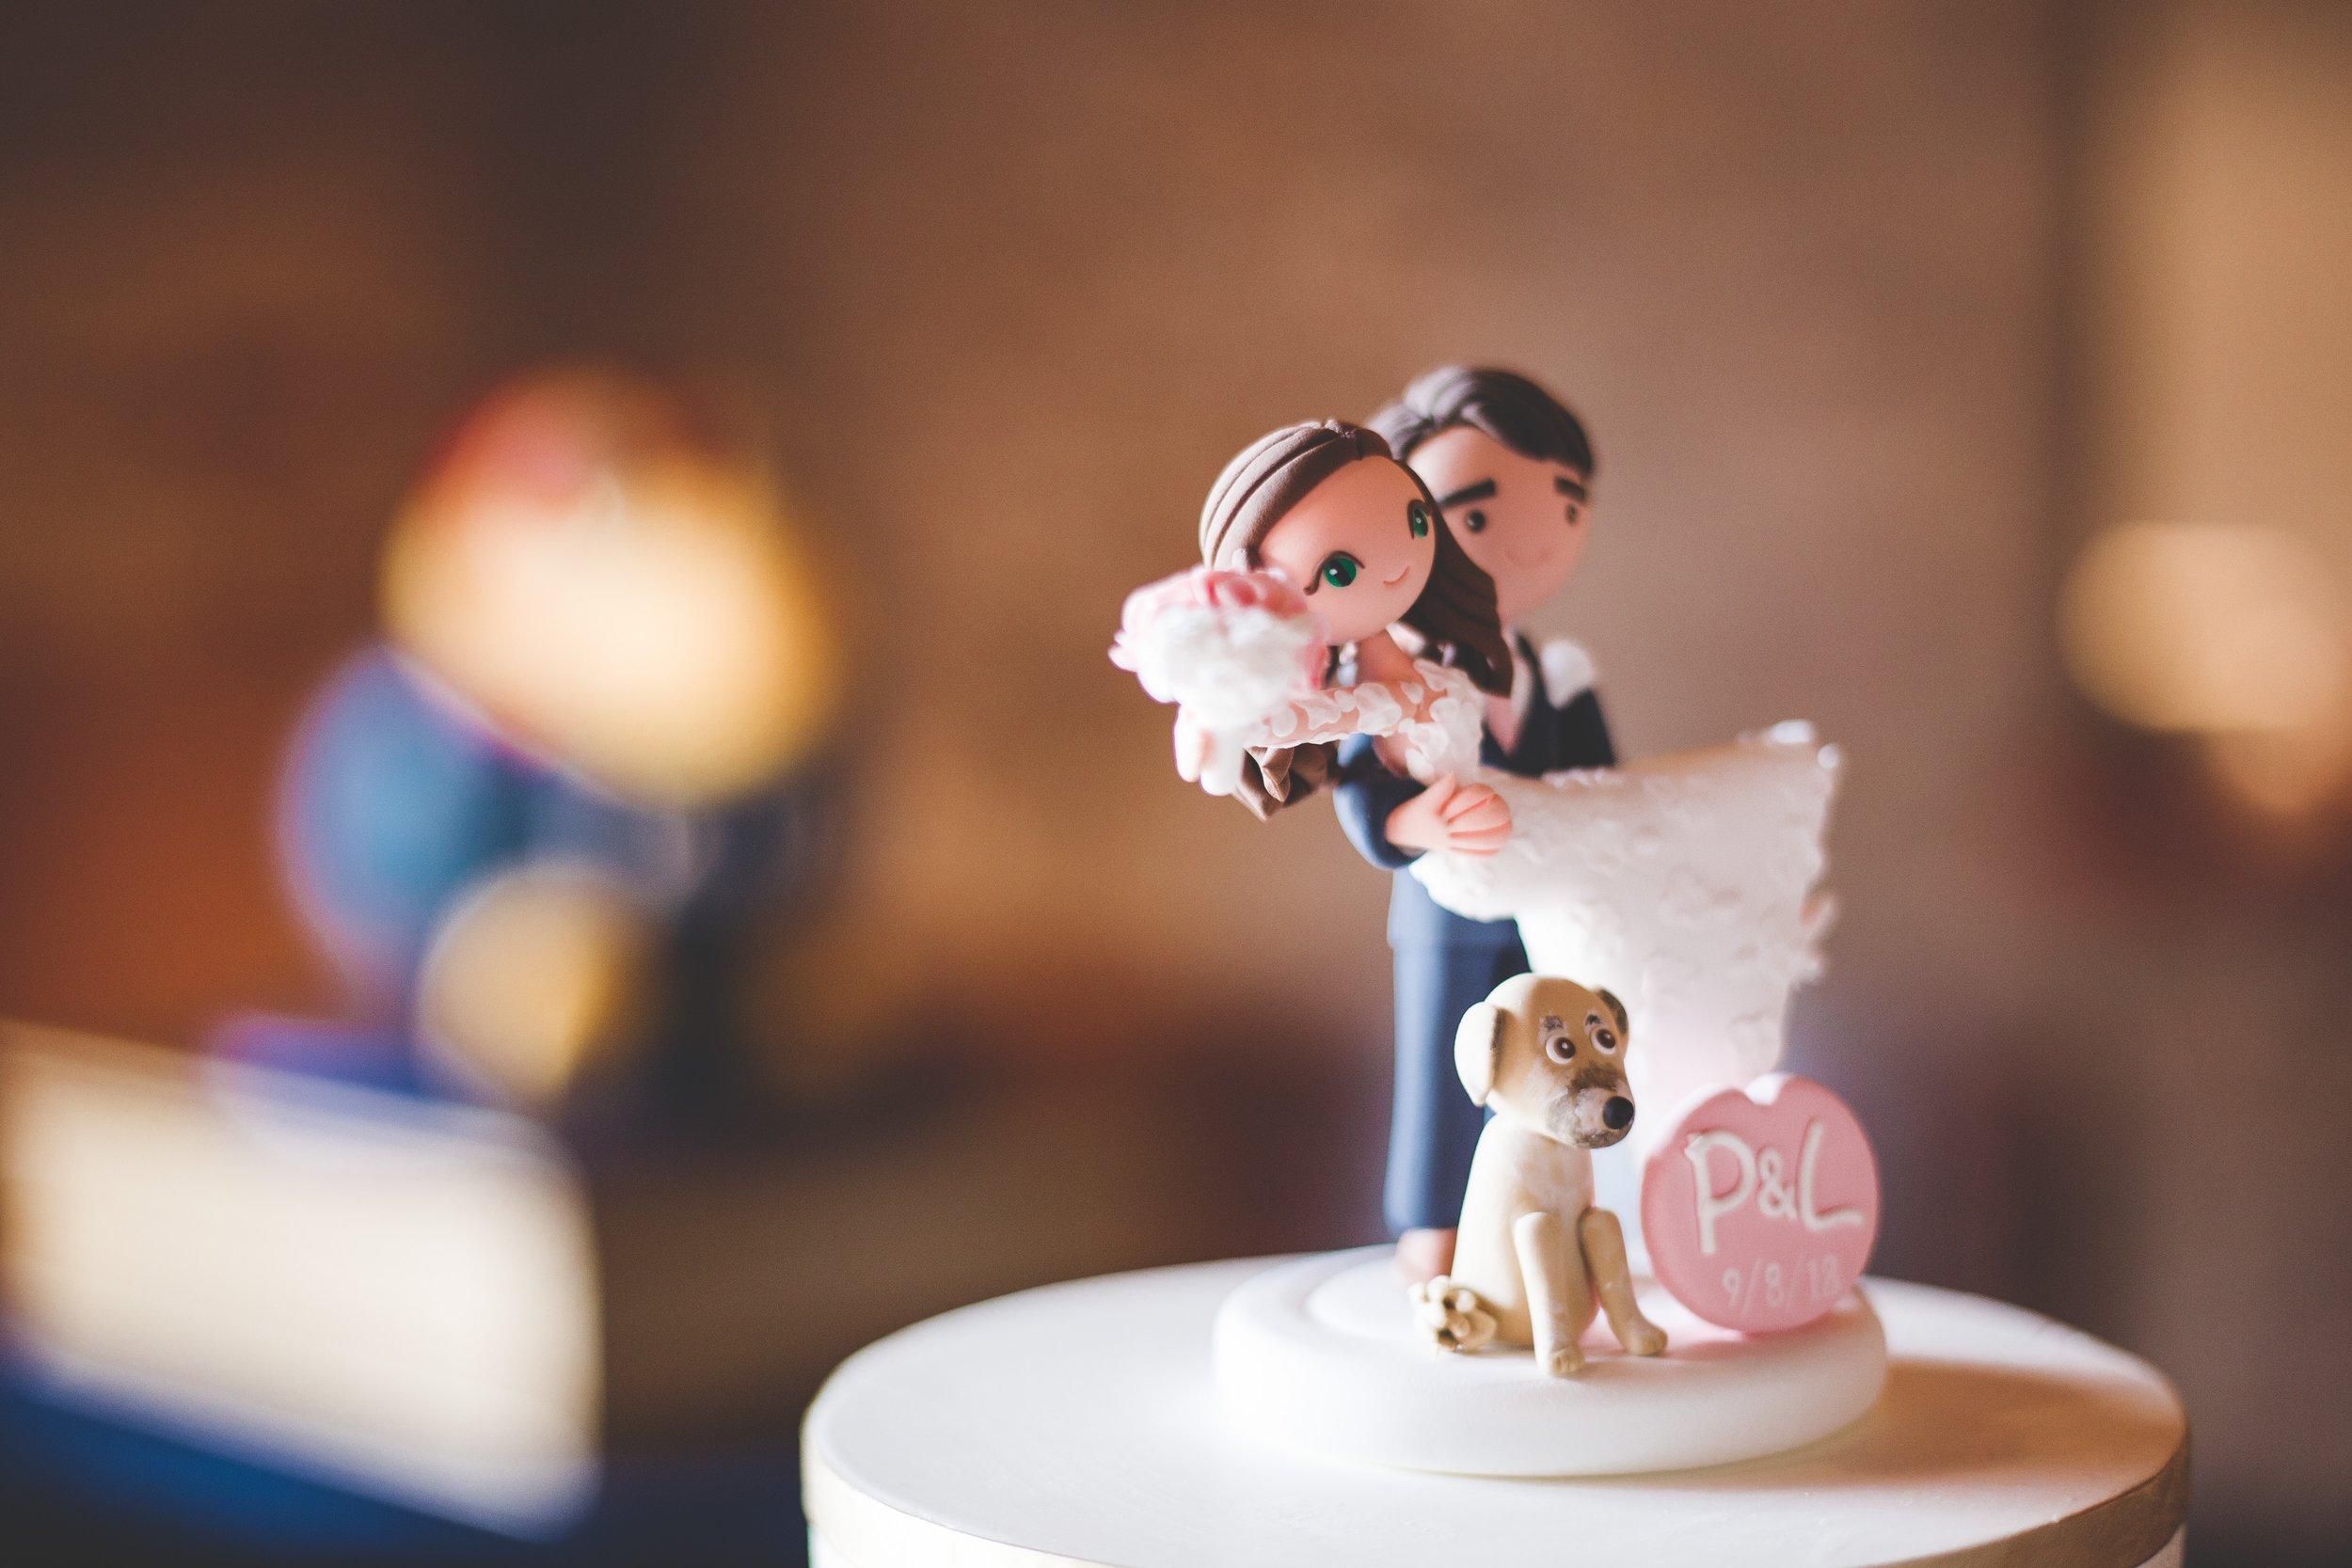 cider-gallery-lawrence-ks-wedding-photographer-jason-domingues-photography-lindsey-paul-blog-0029.jpg